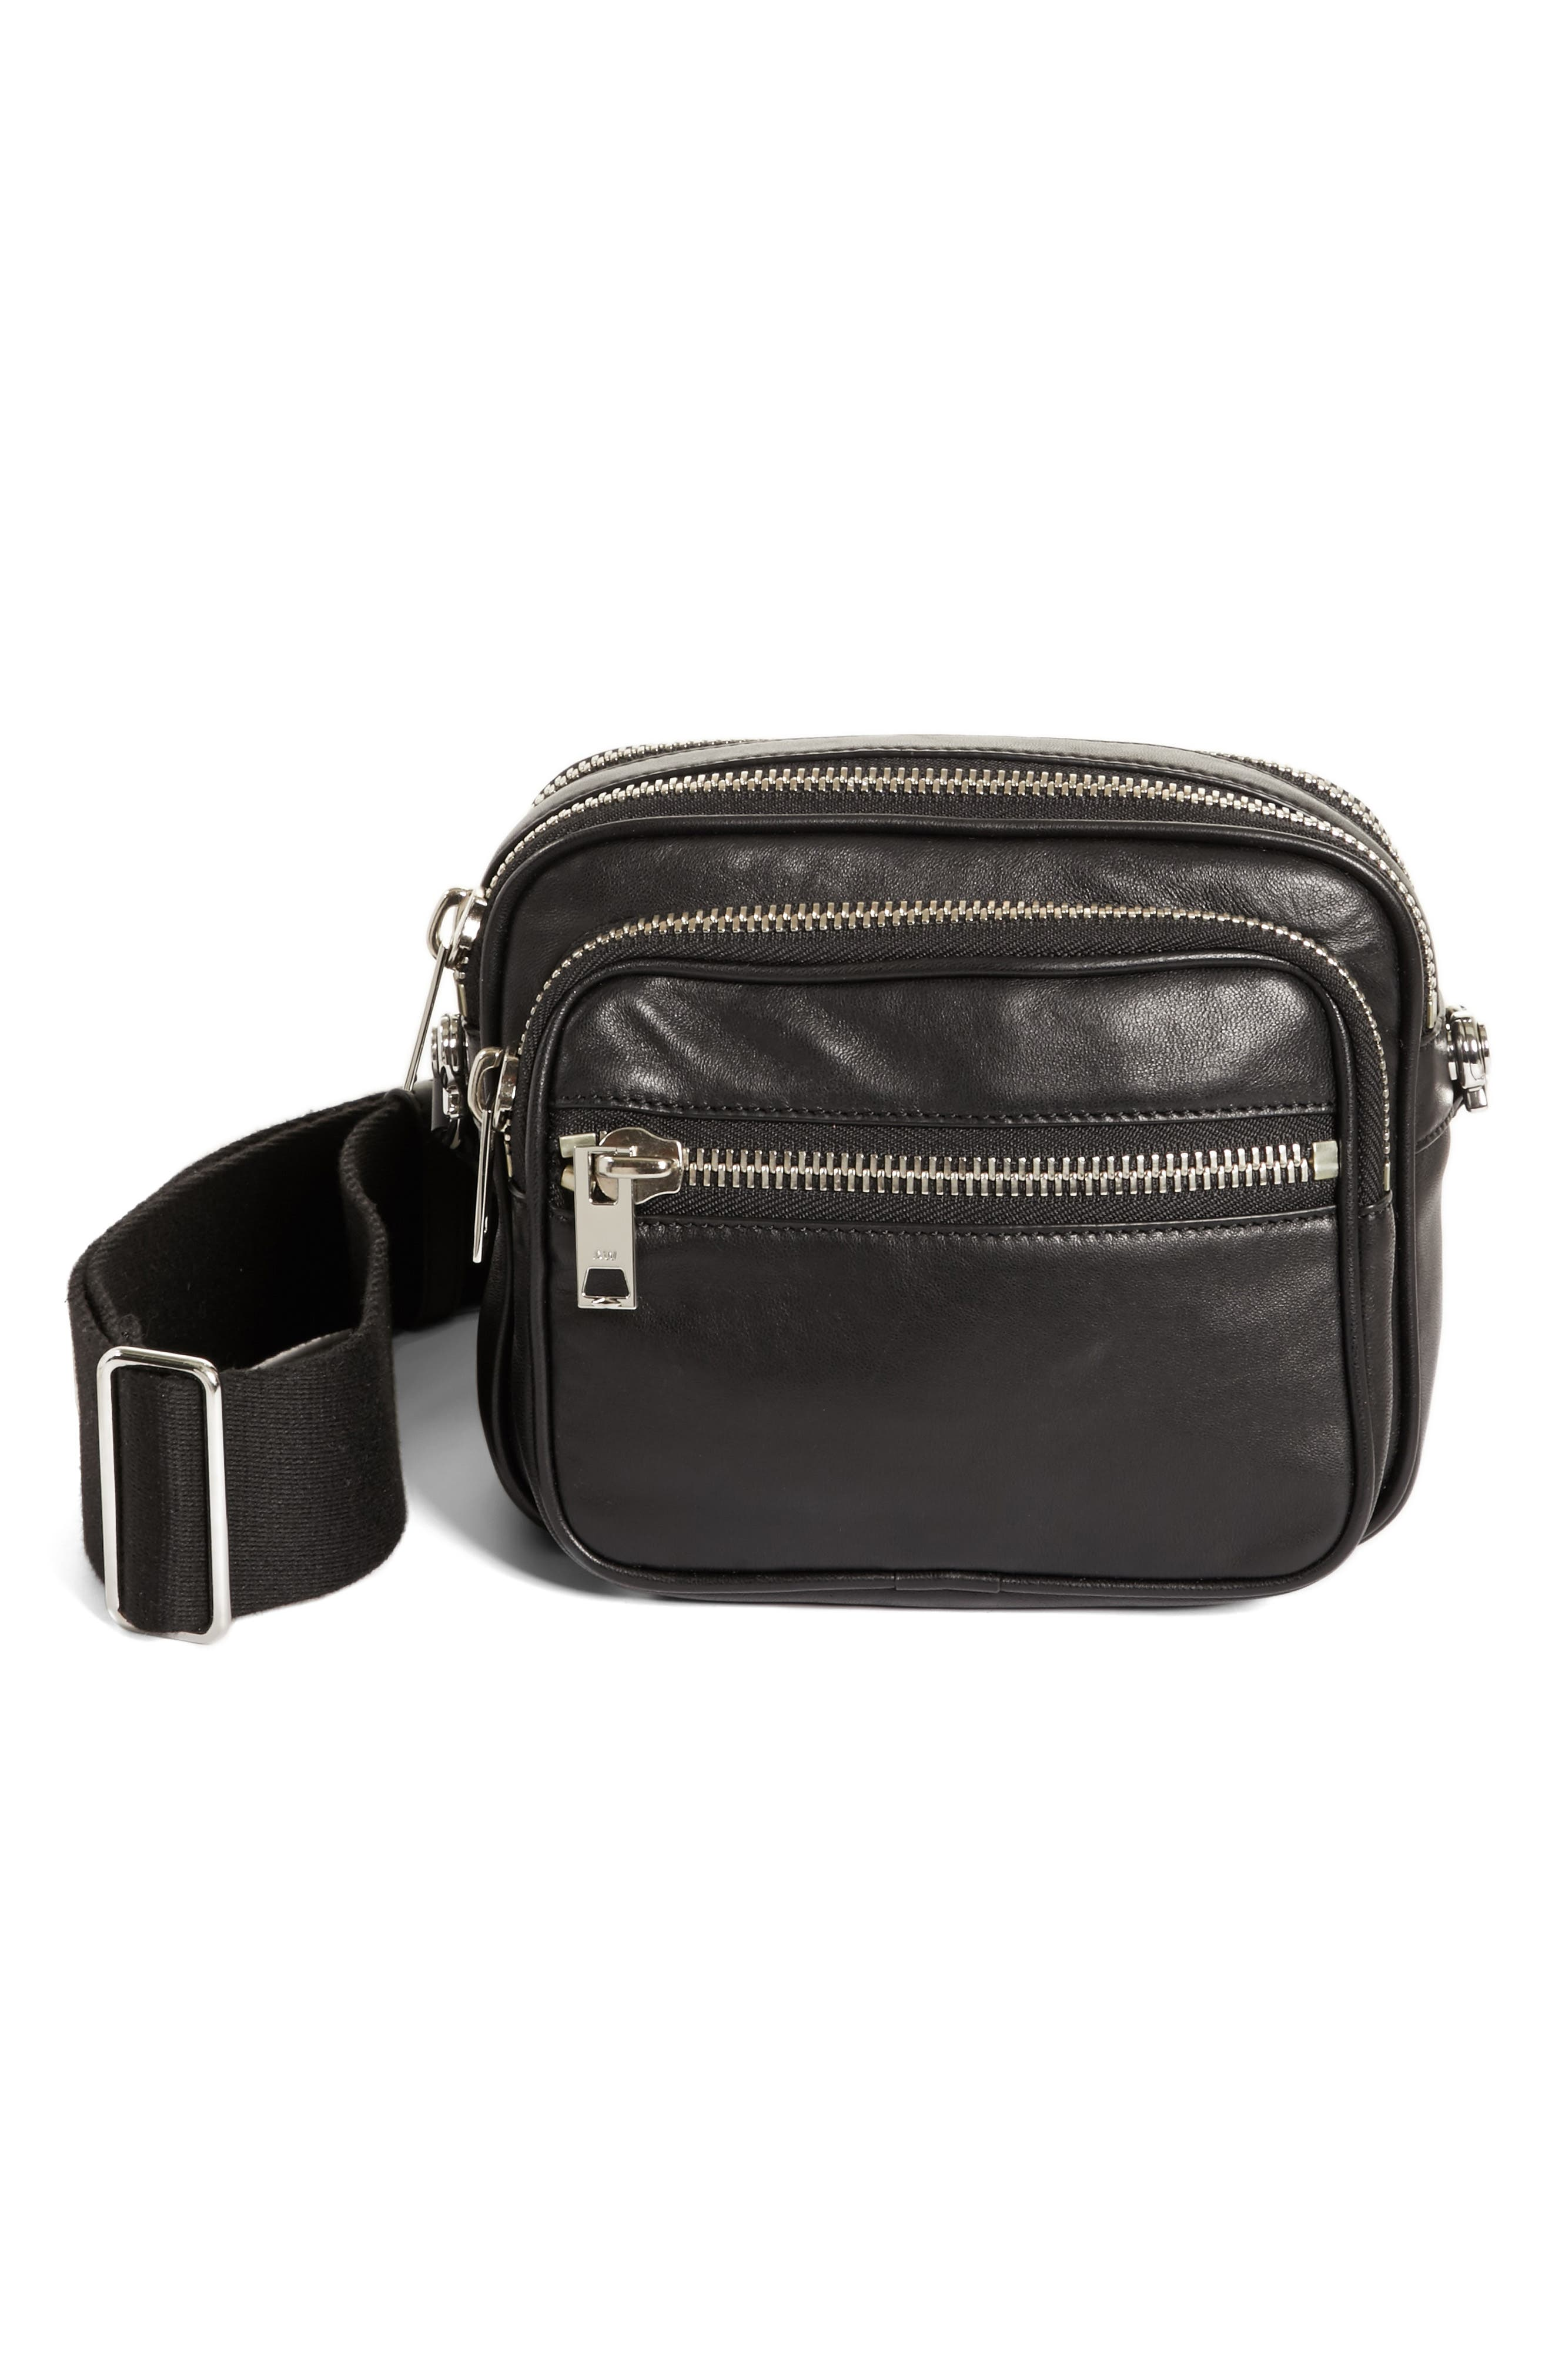 Alternate Image 1 Selected - Alexander Wang Large Attica Leather Crossbody Bag